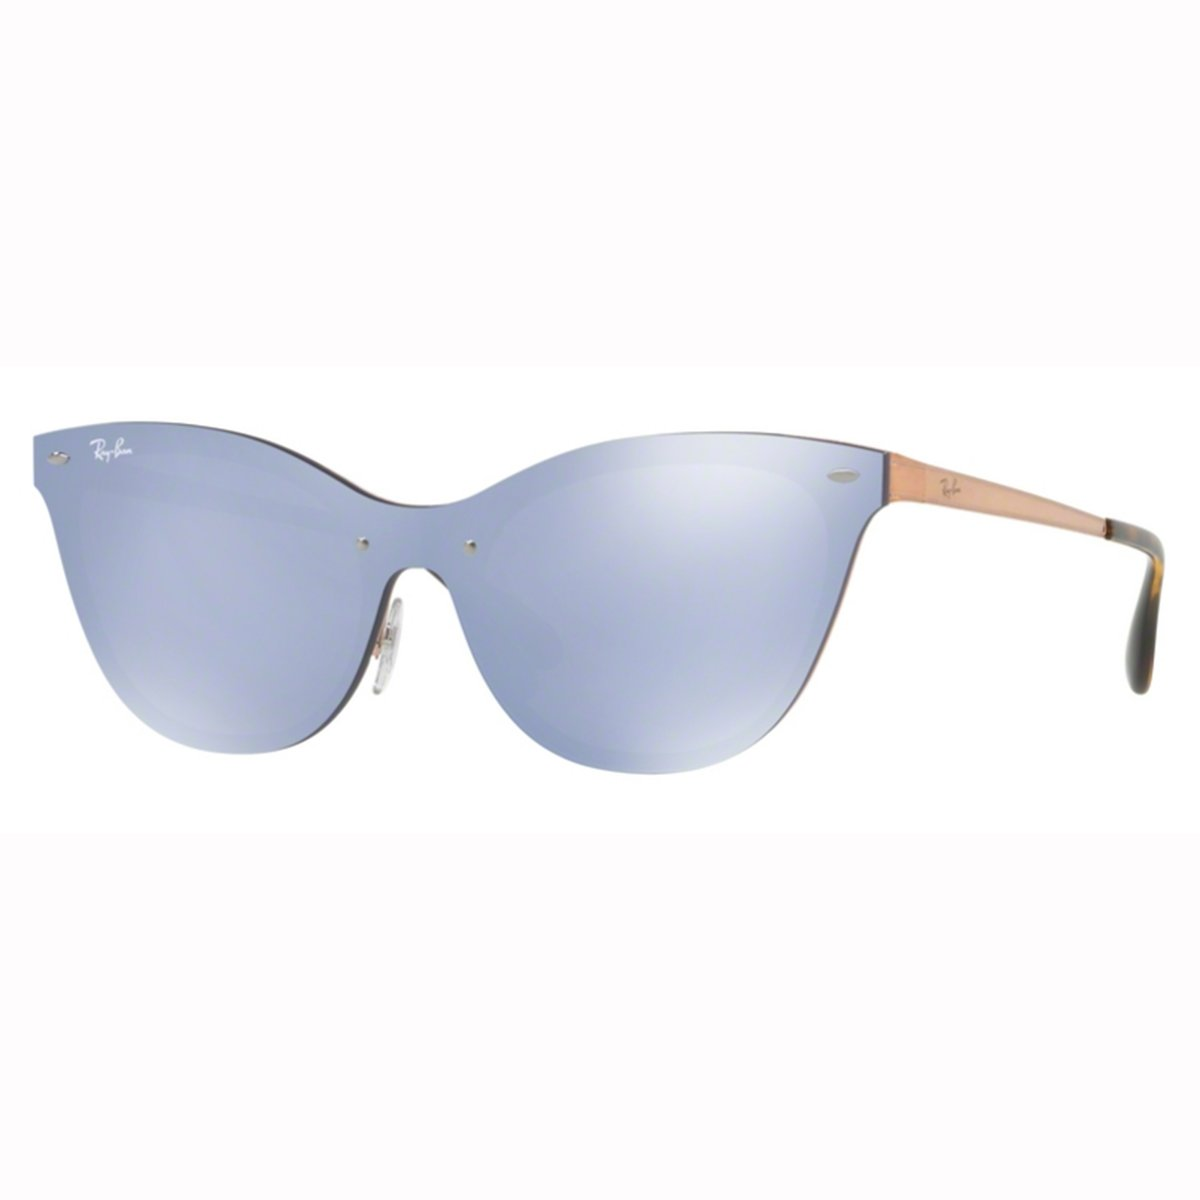 f4188fcb719eb Compre Óculos de Sol Ray Ban Blaze Cat Eye em 10X   Tri-Jóia Shop